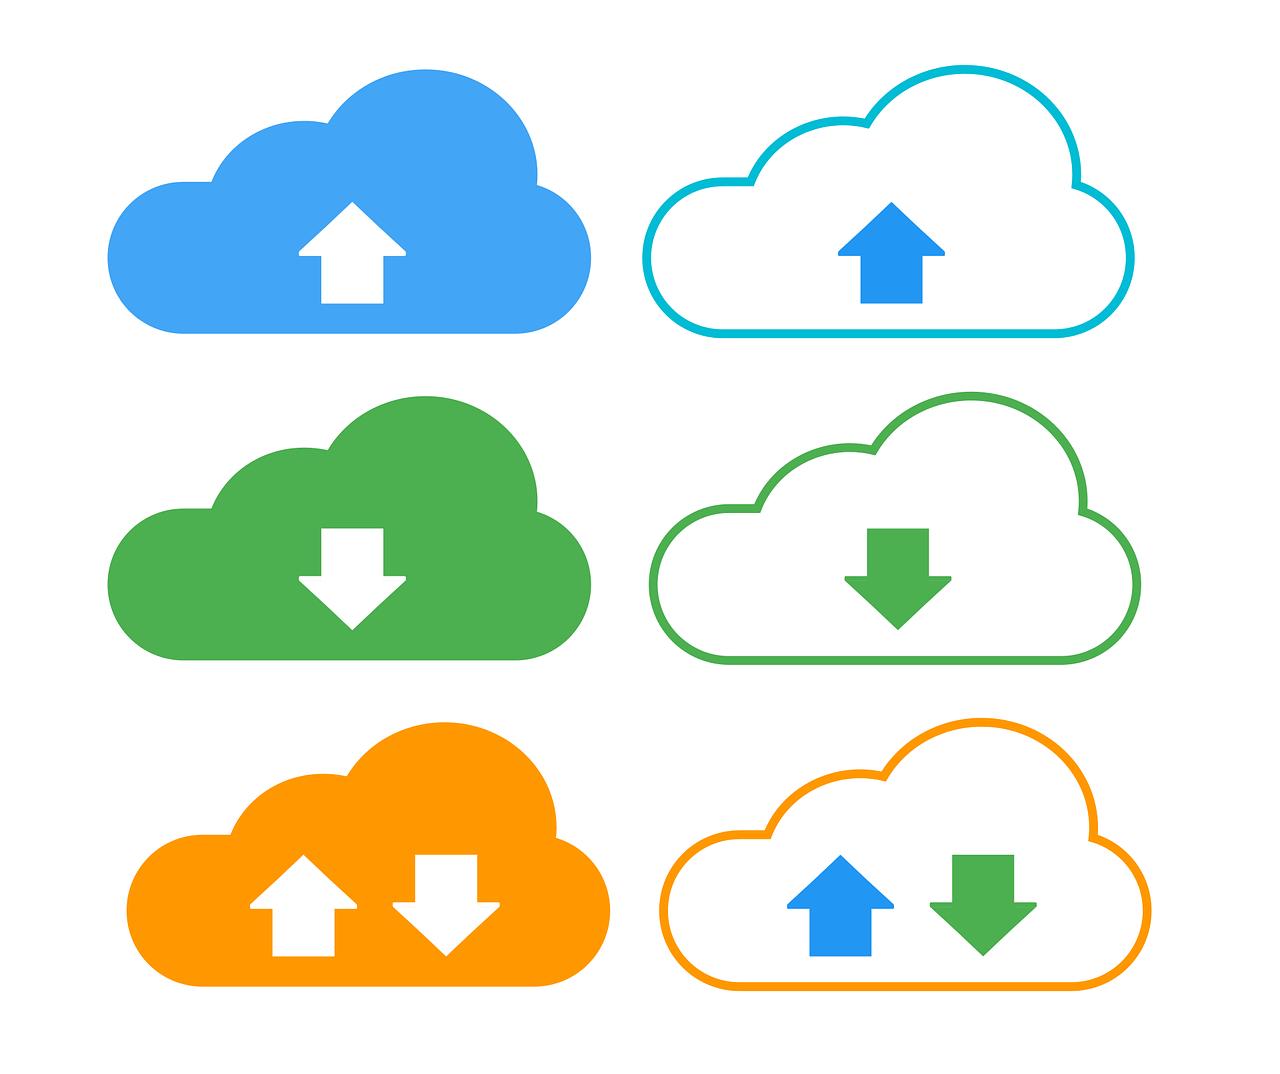 Codeigniter-การเขียนโปรแกรม-สร้างการอัพโหลด-File-ด้วย-File-uploading-class